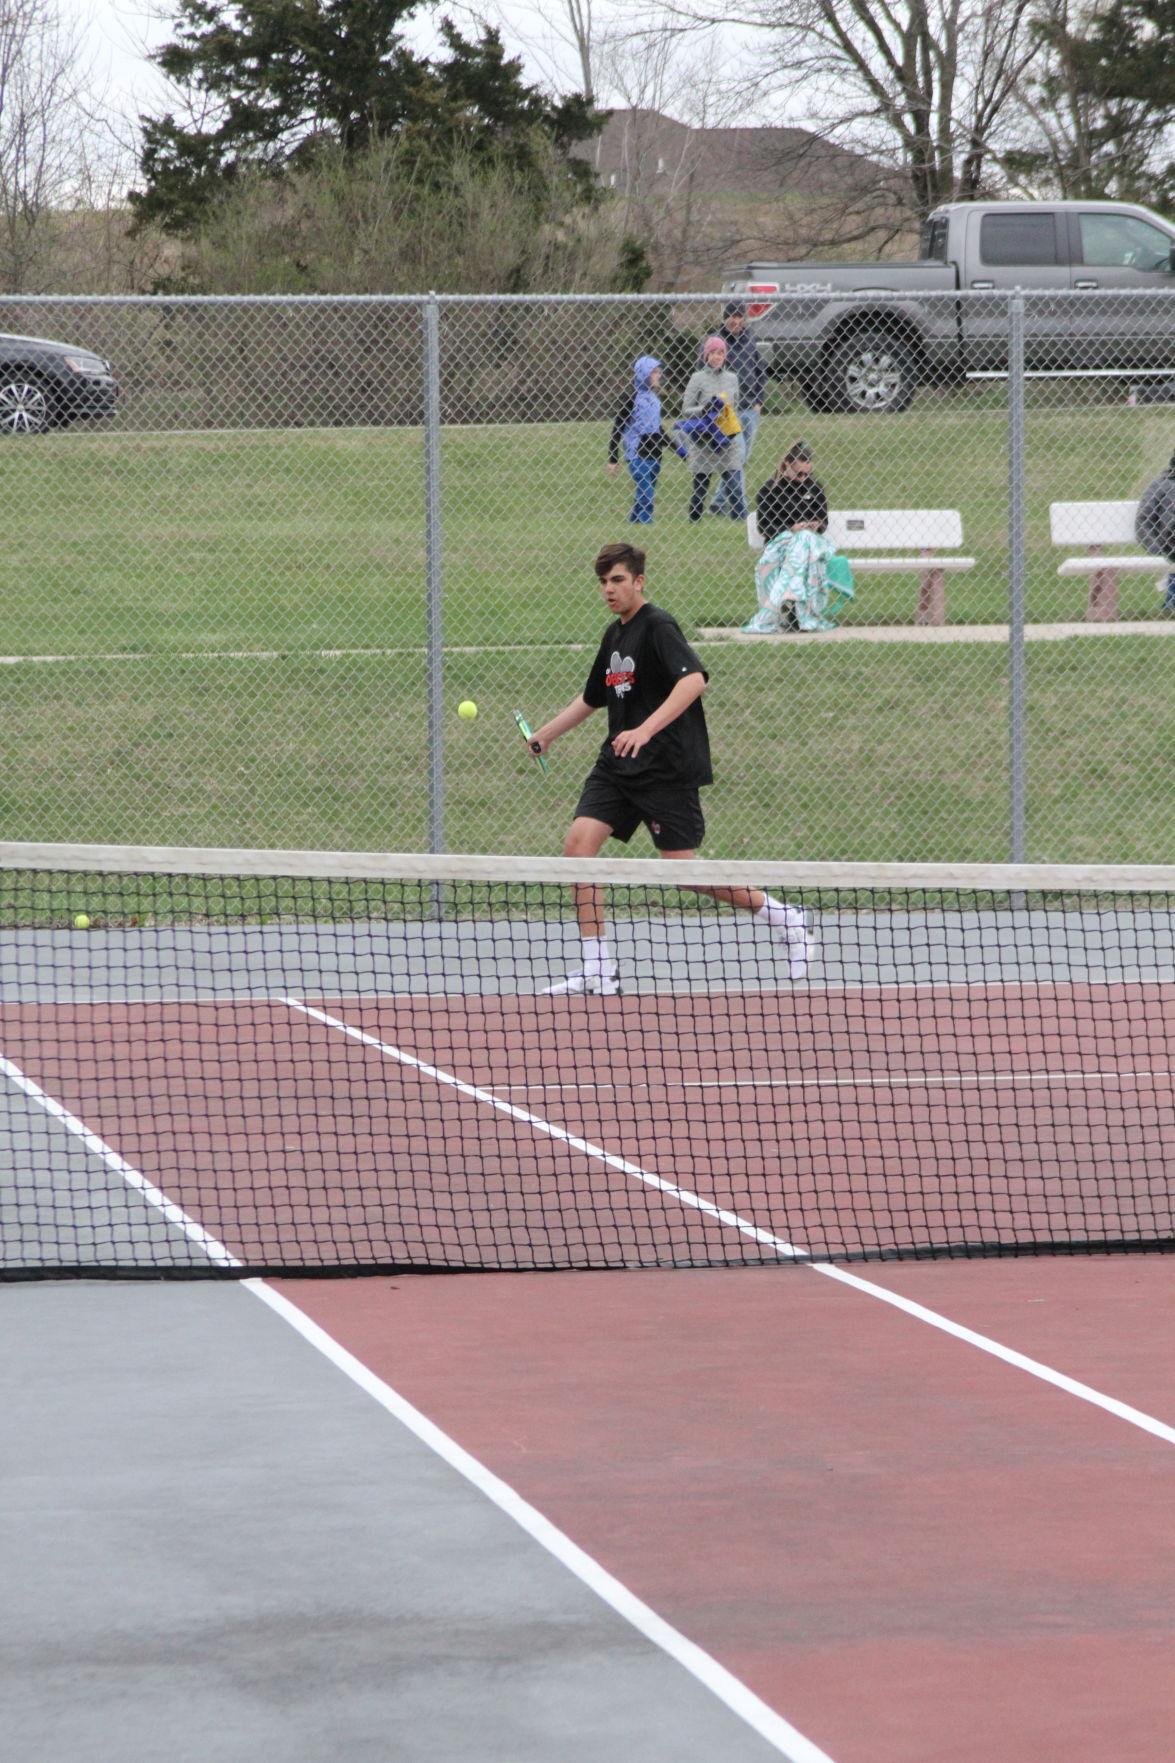 dcx-04212021-spt-wd-boys-tennis-IMG_7295.JPG